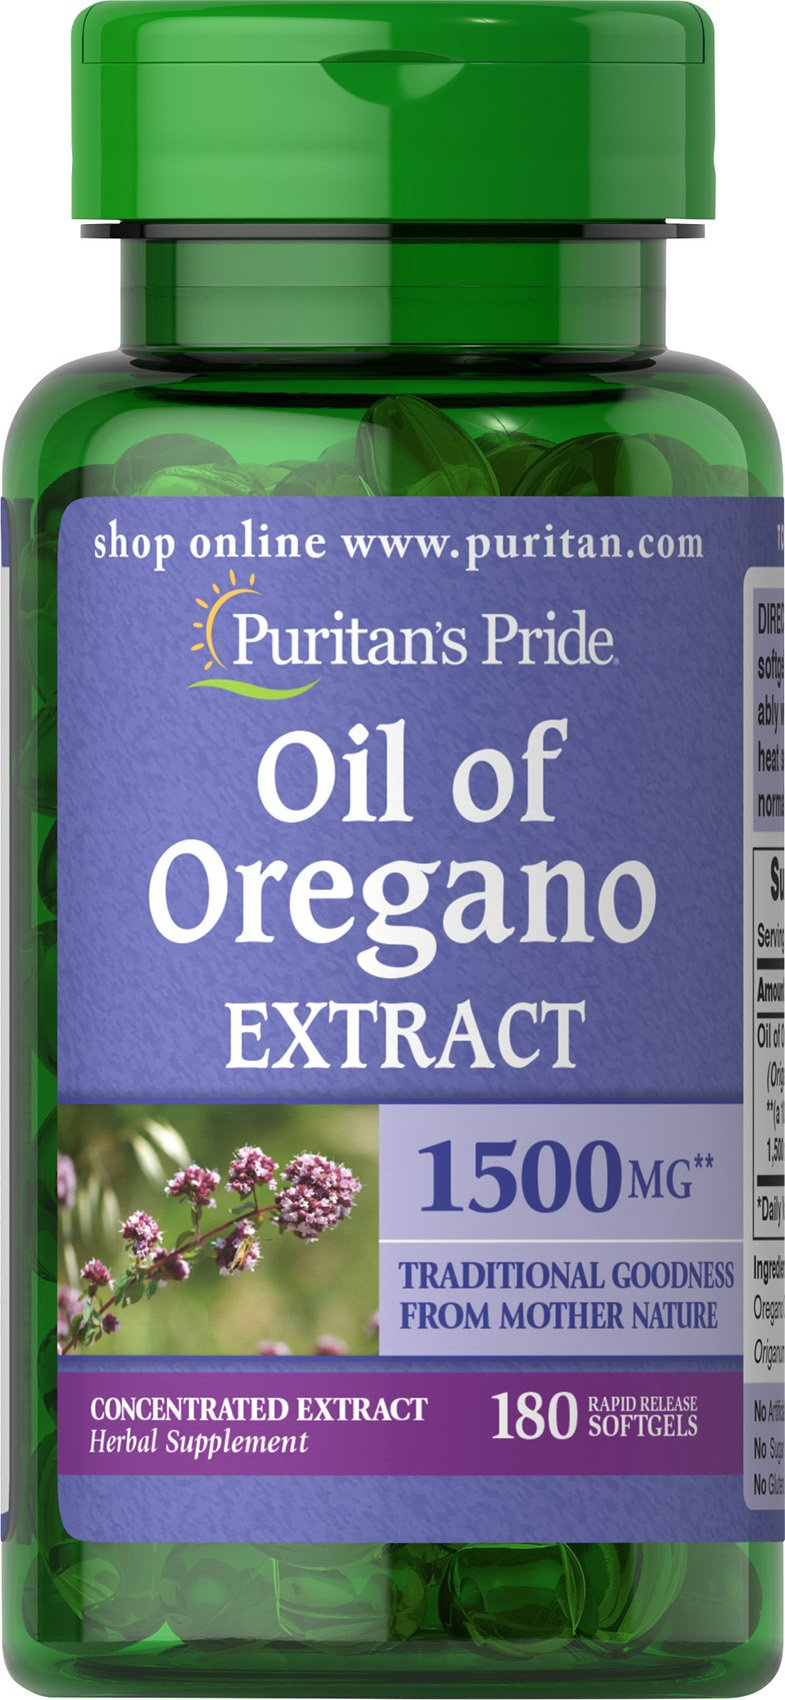 Puritan's Pride Oil of Oregano Extract 1500 mg-180 Softgels